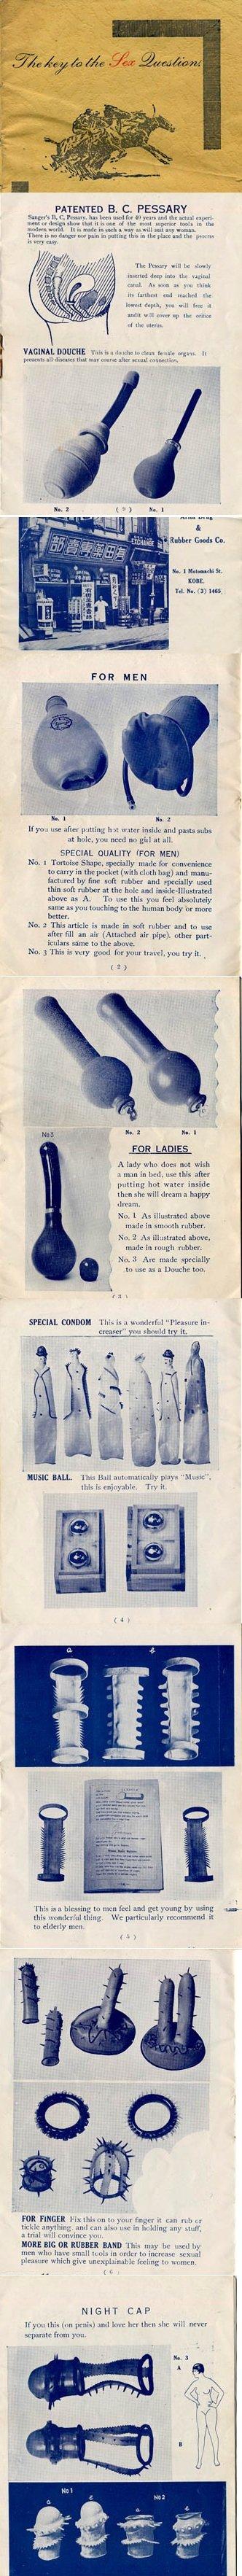 "Old Sex Toys. . PATENTED B. C. PESSARY mormor bluesiest ' ""u, II "" LEI: arr Eh: ! Ina}. Irh Alie II'! ""arro witrh. ll "" mam in much u """" ma will nail arty : AIL"